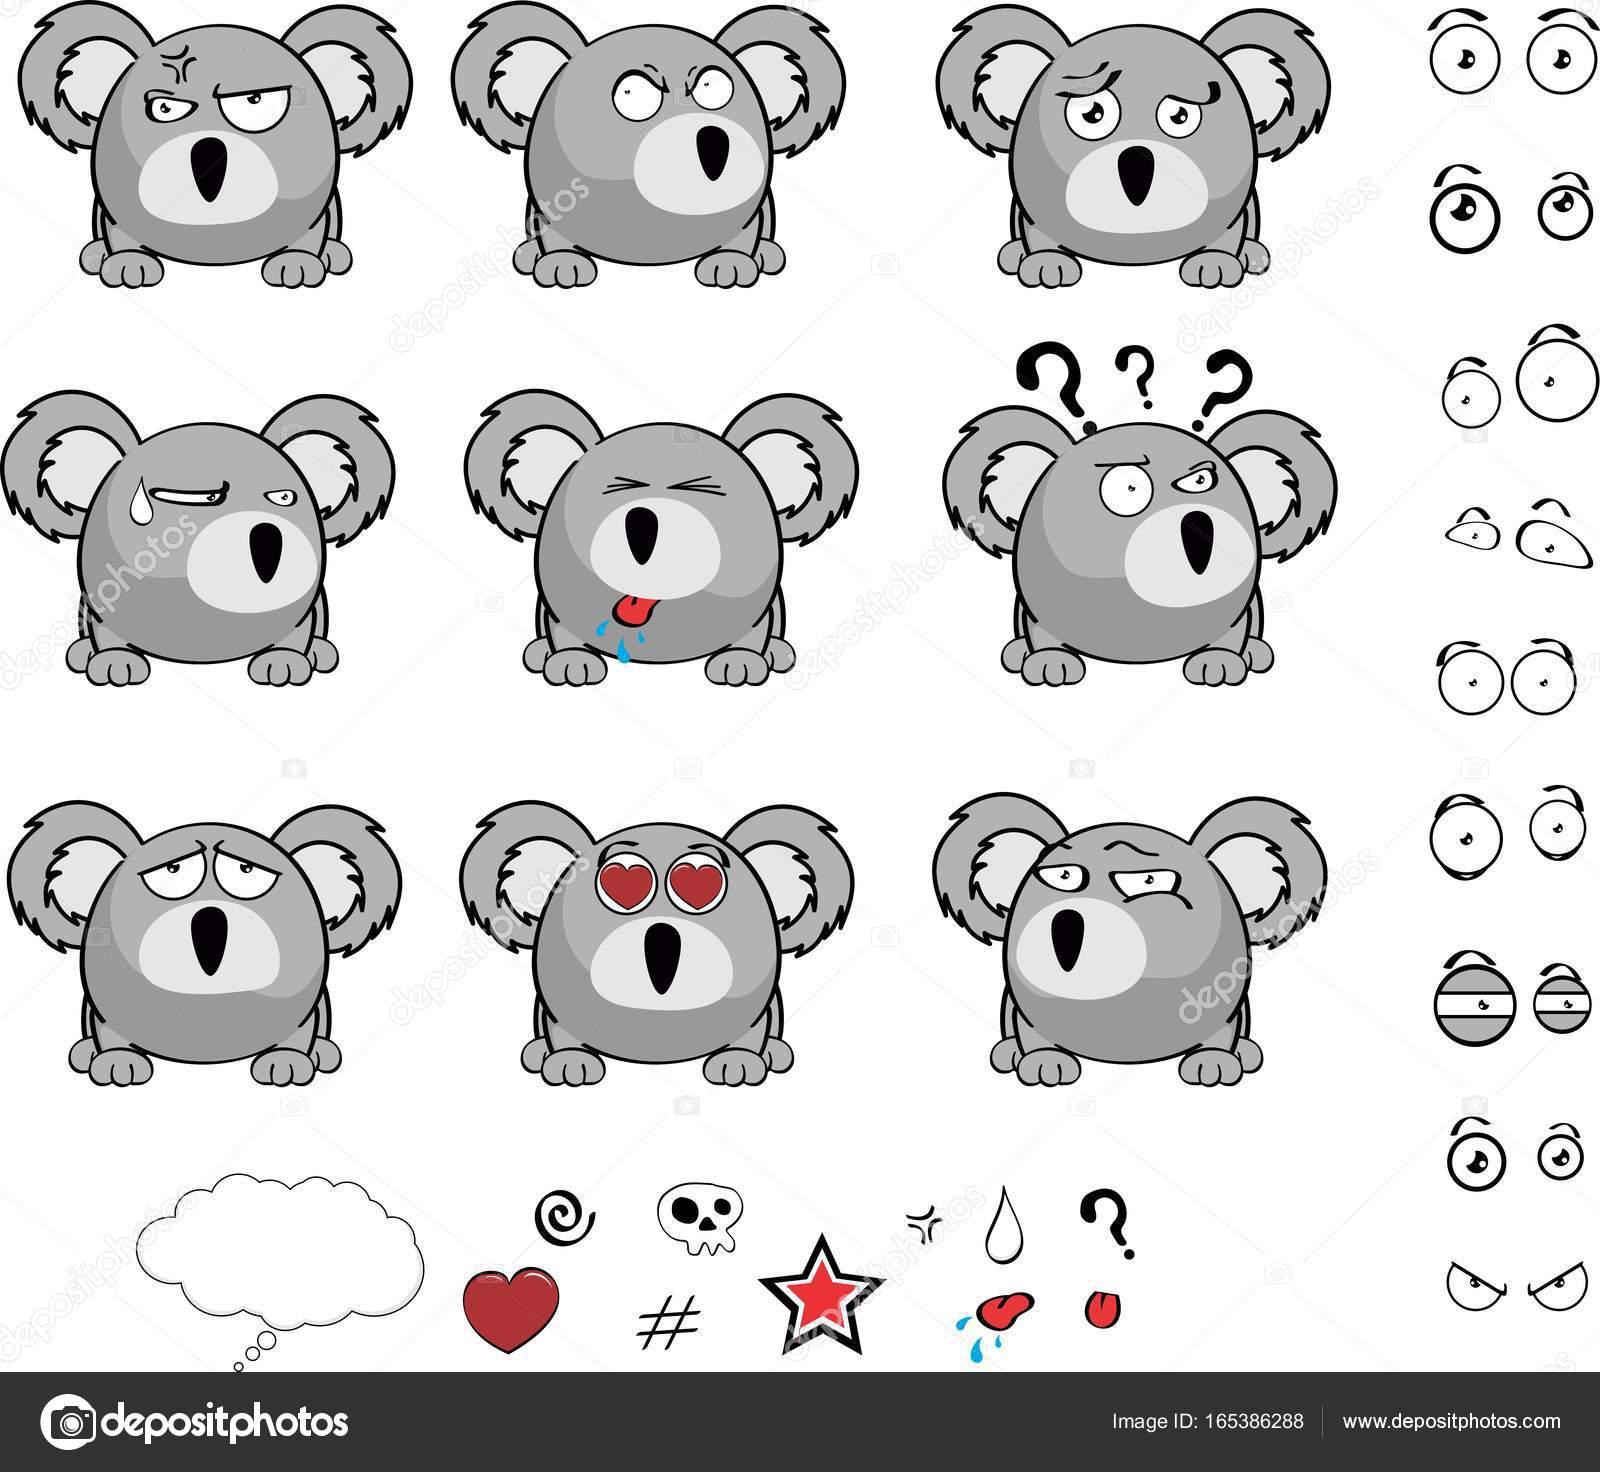 Ensemble D Expressions Dessin Anime Koala Mignon Bebe Boule Image